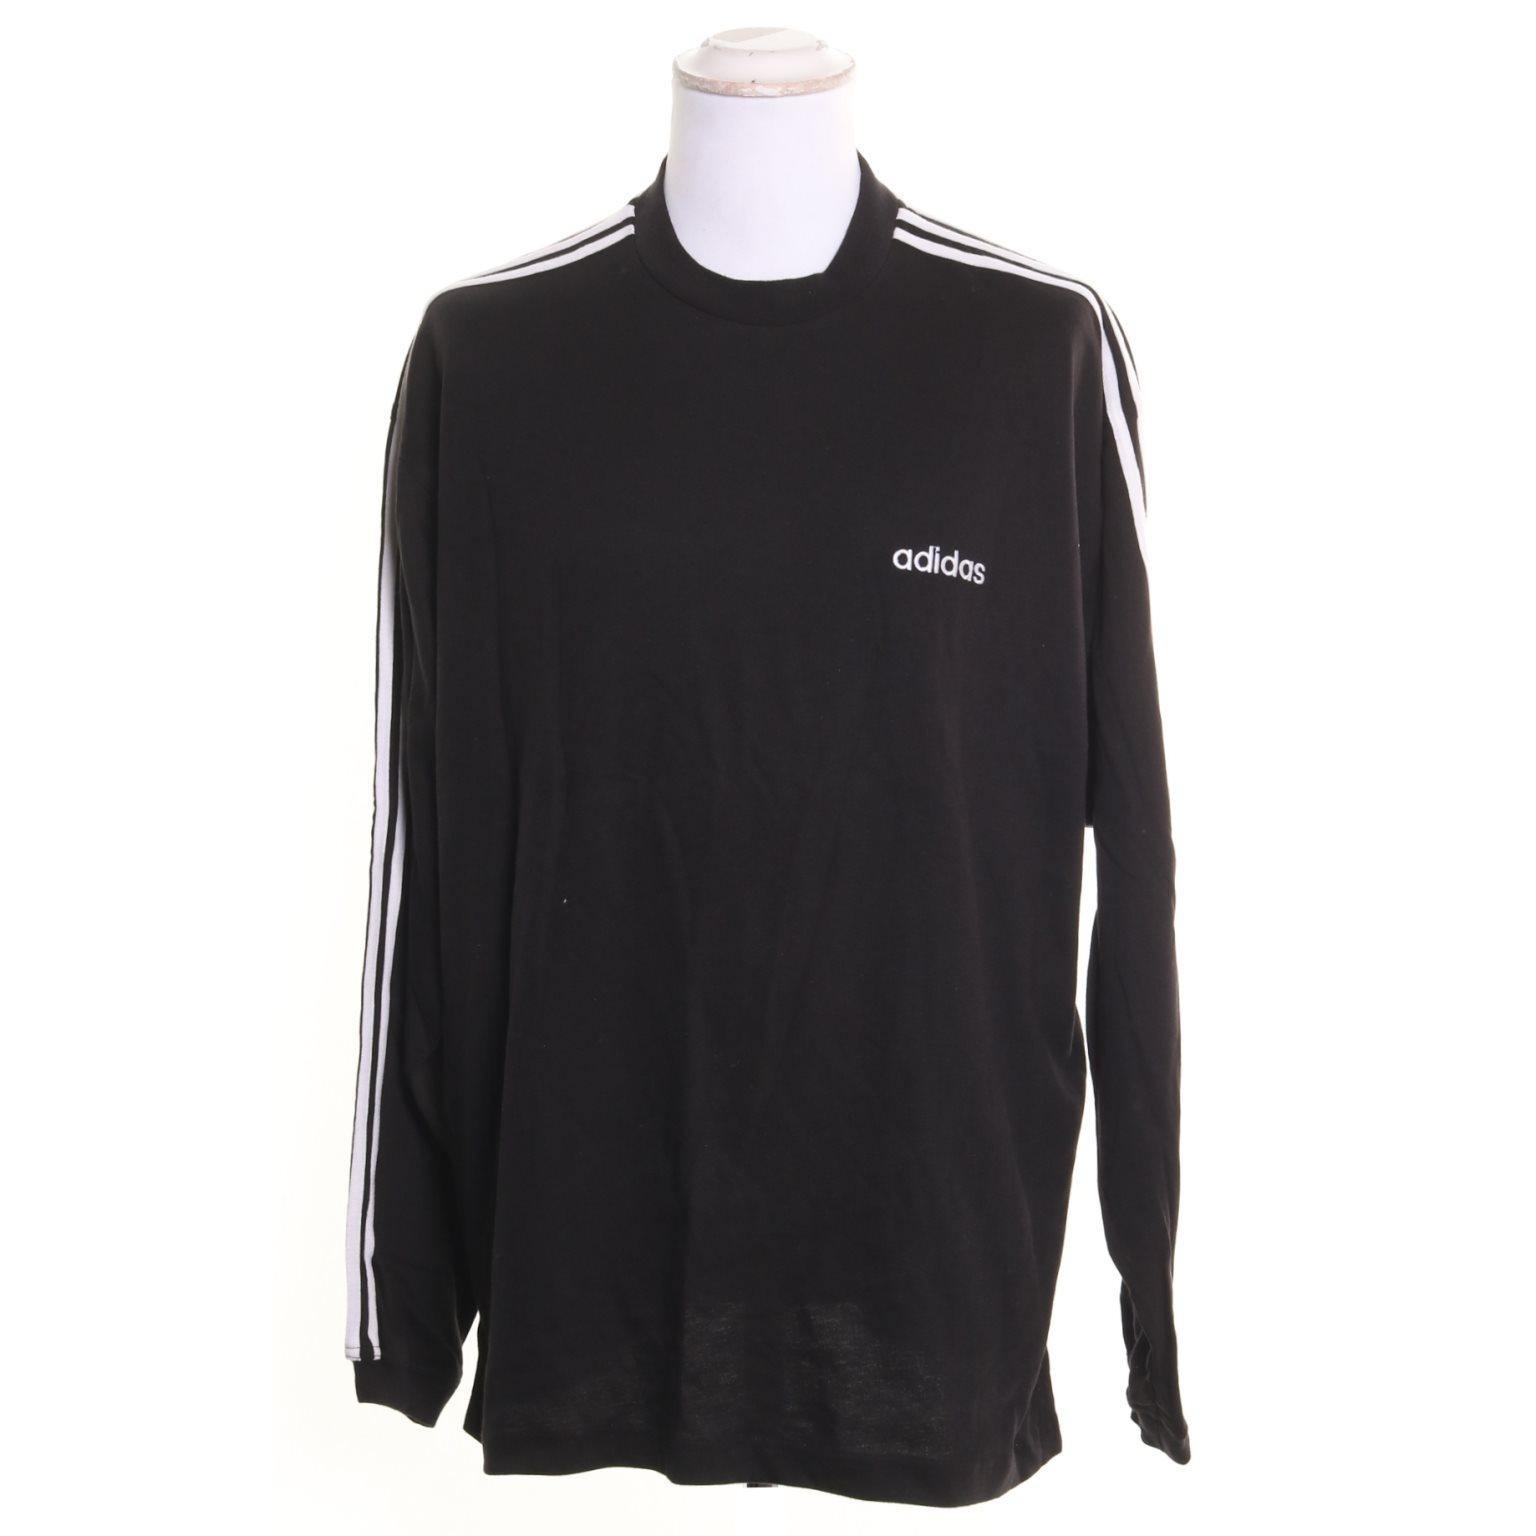 svart vit adidas tröja